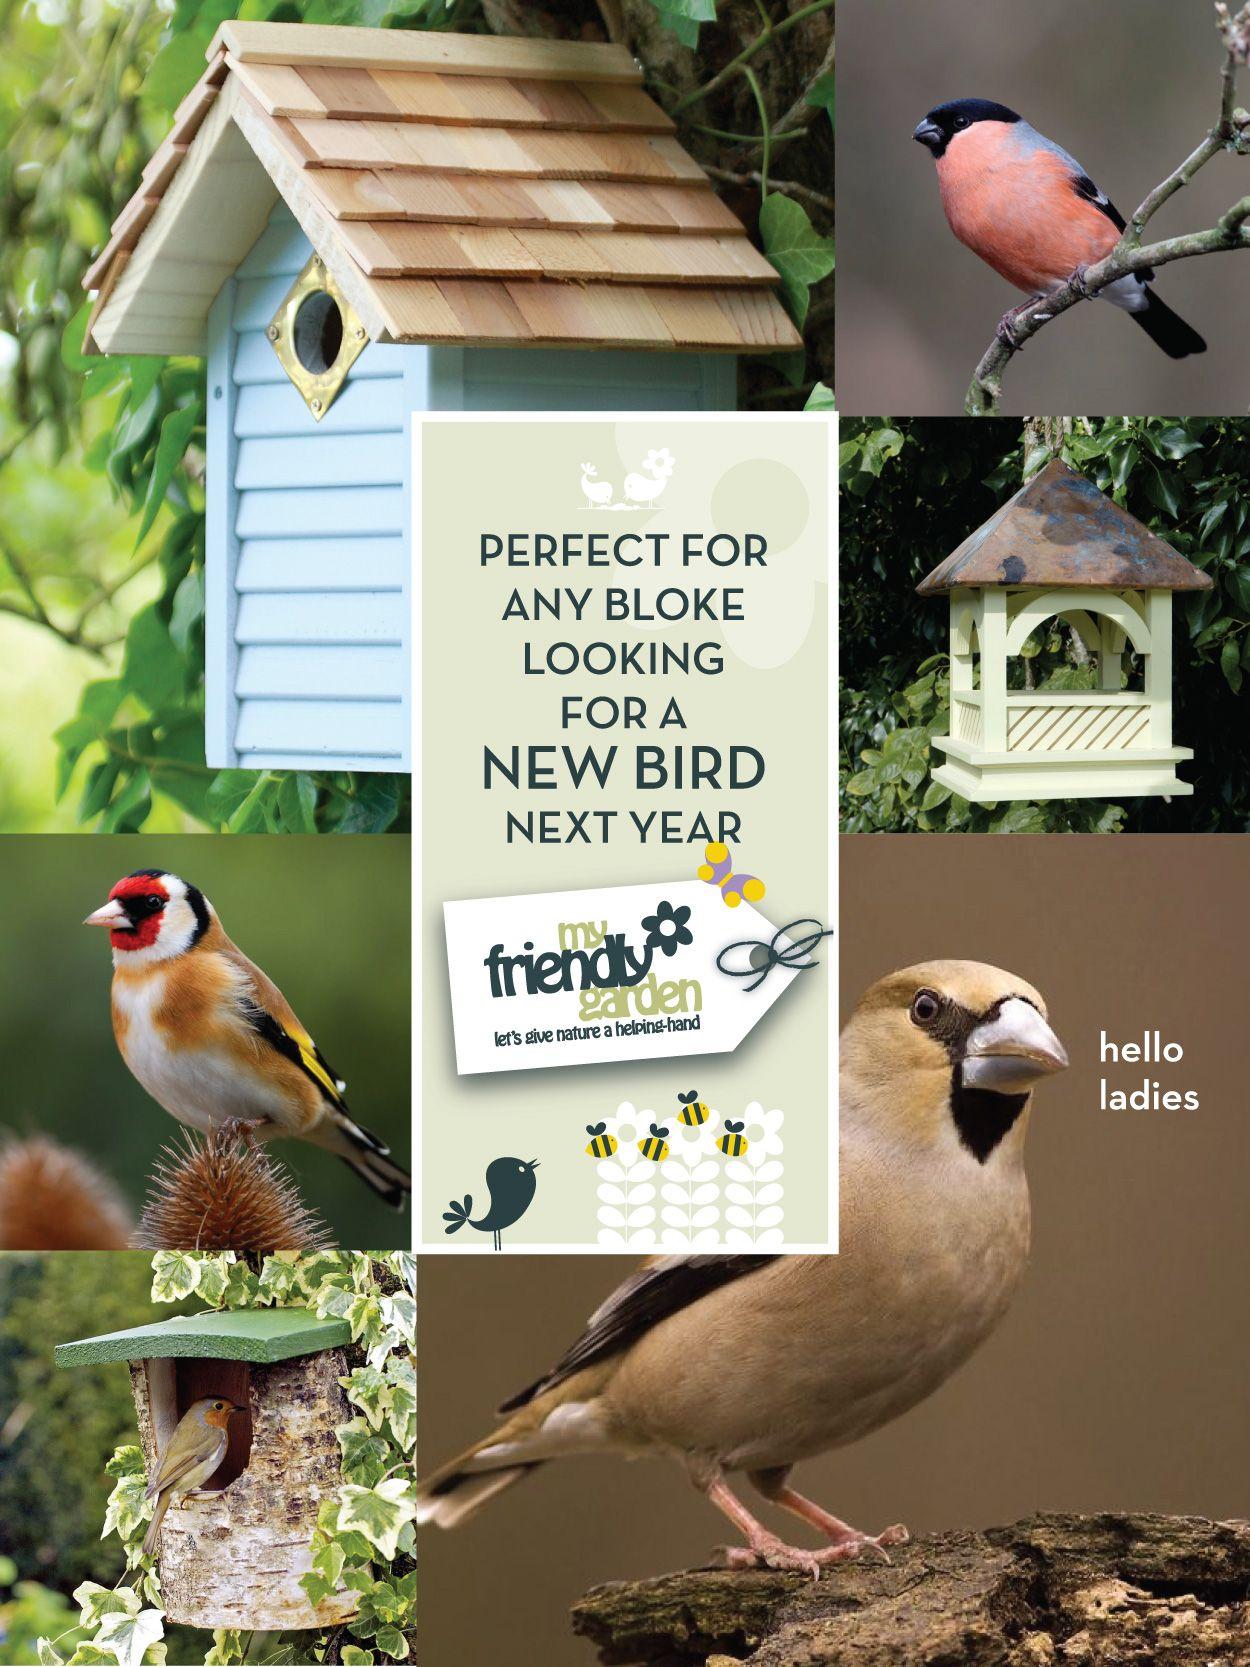 Birdwatching dating sites